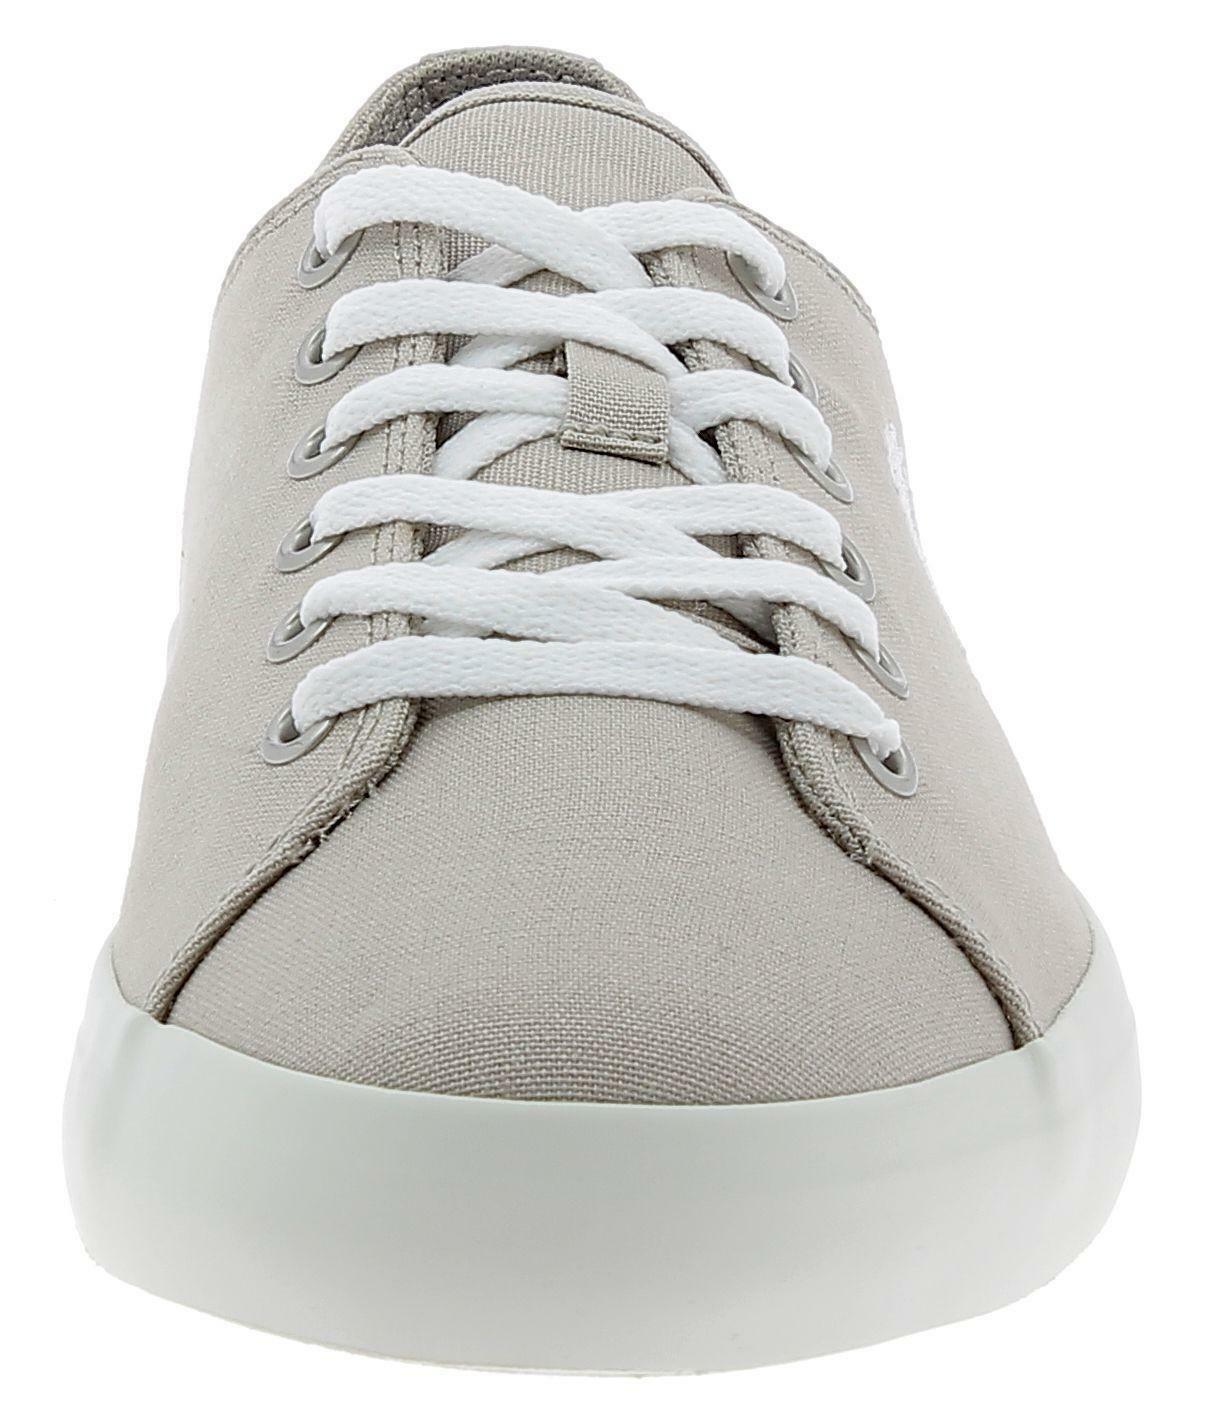 timberland timberland newport bay canvas scarpe sportive uomo beige a1q78